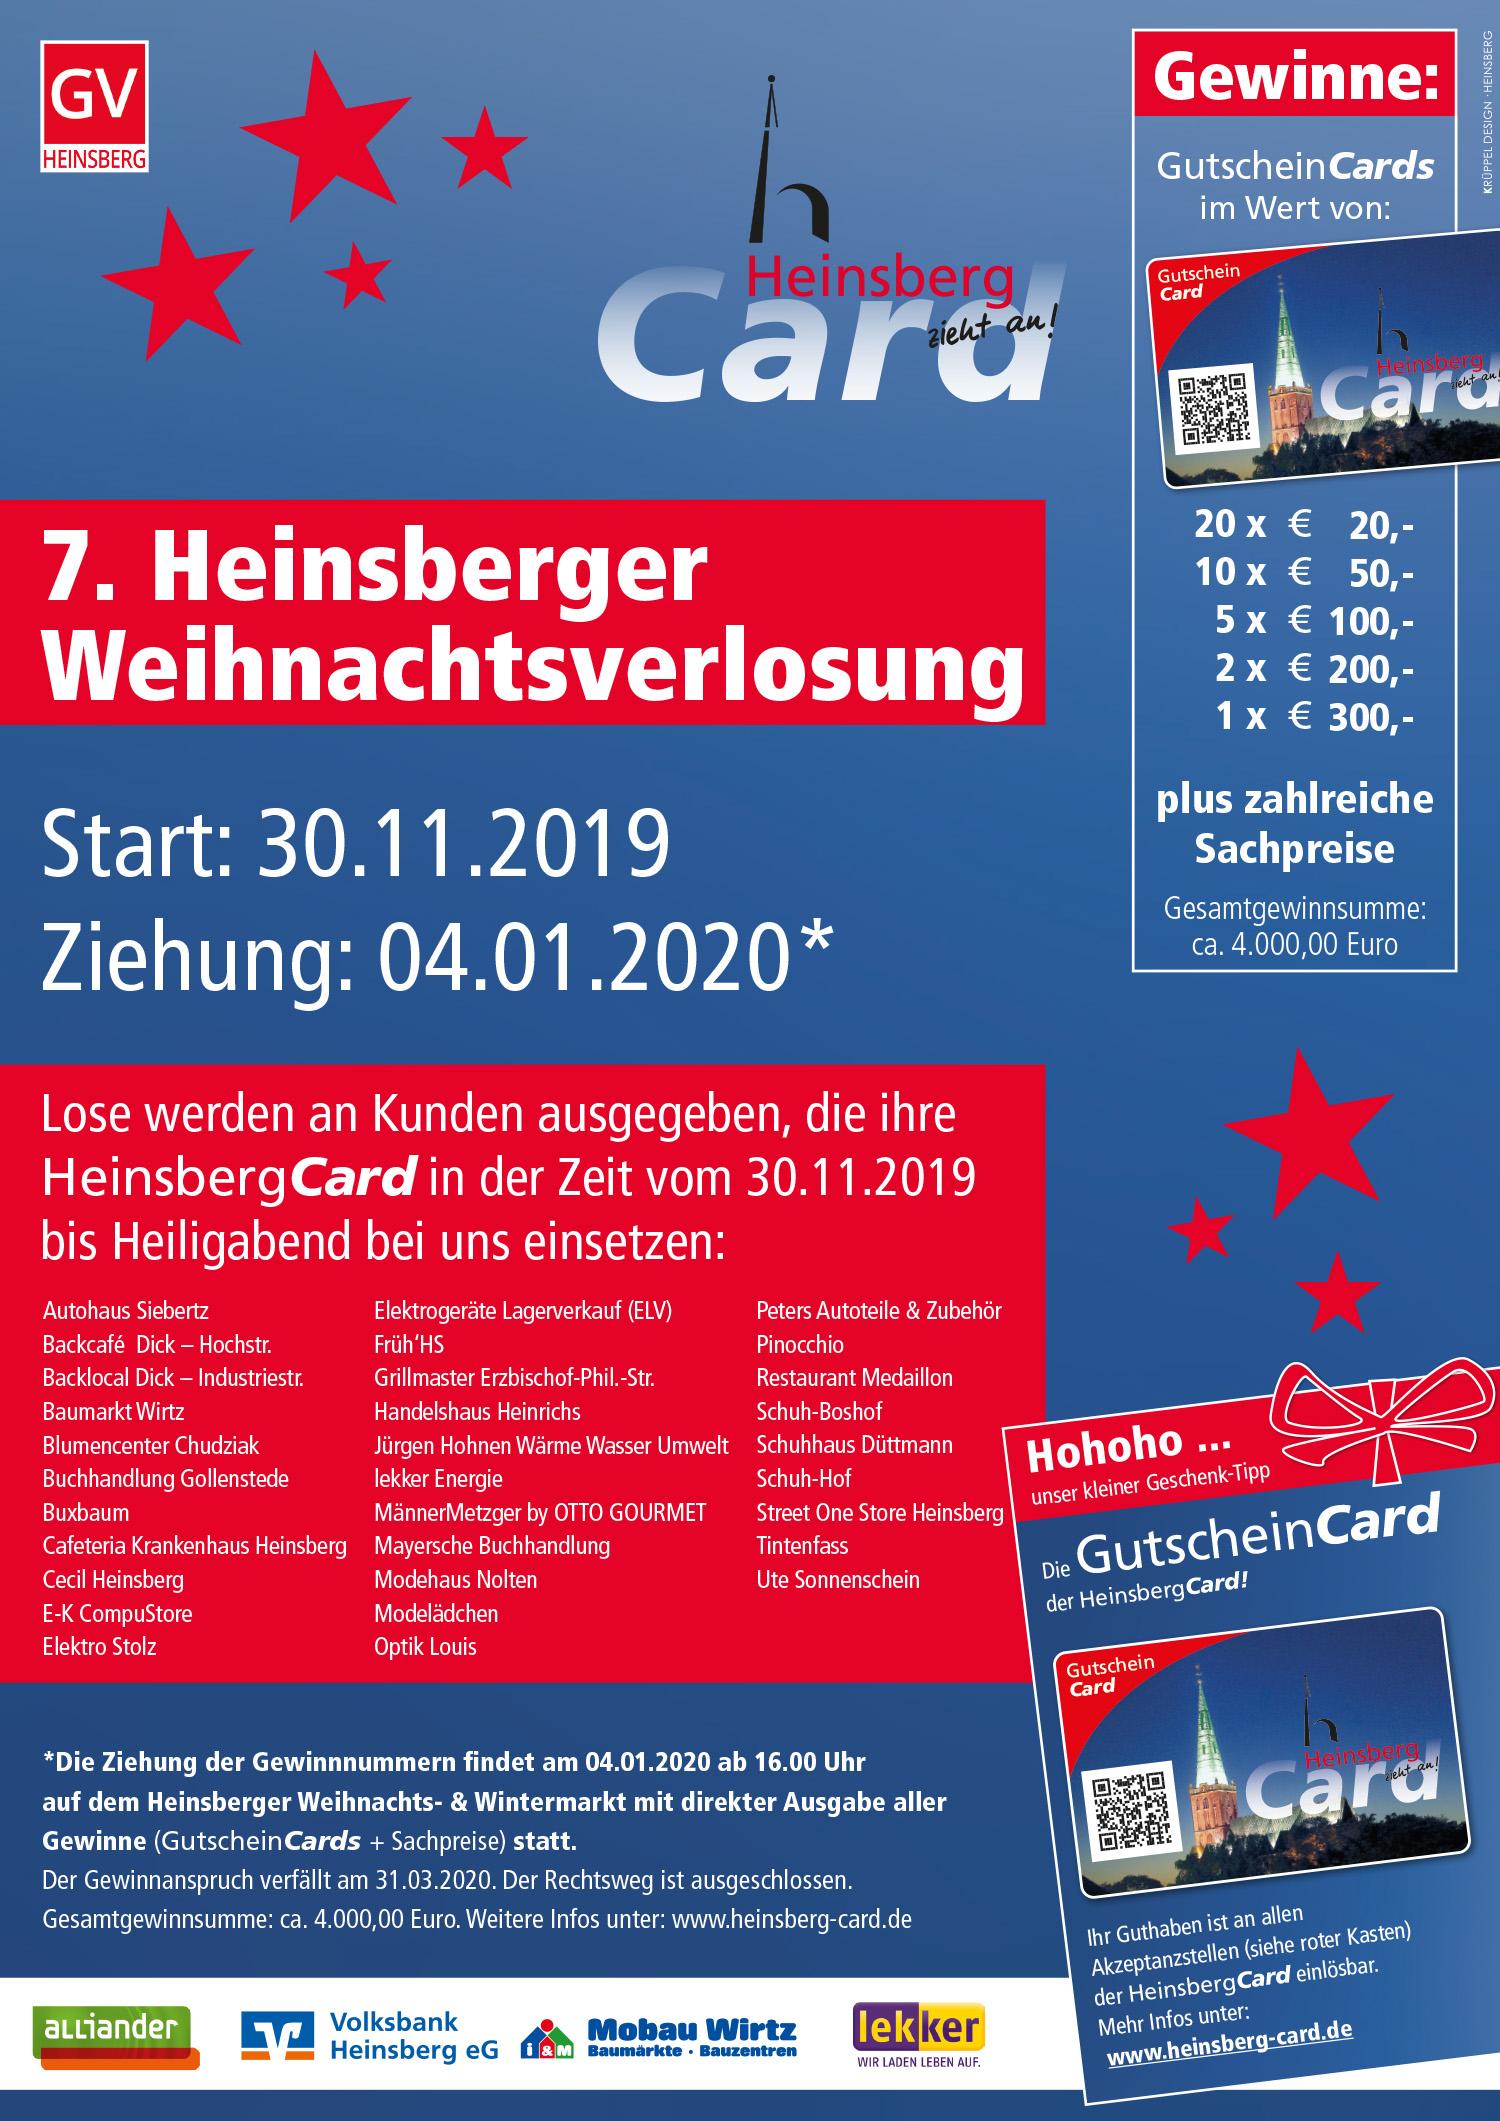 DINA 3_HeinsbergCard_Verlosung_2019.indd